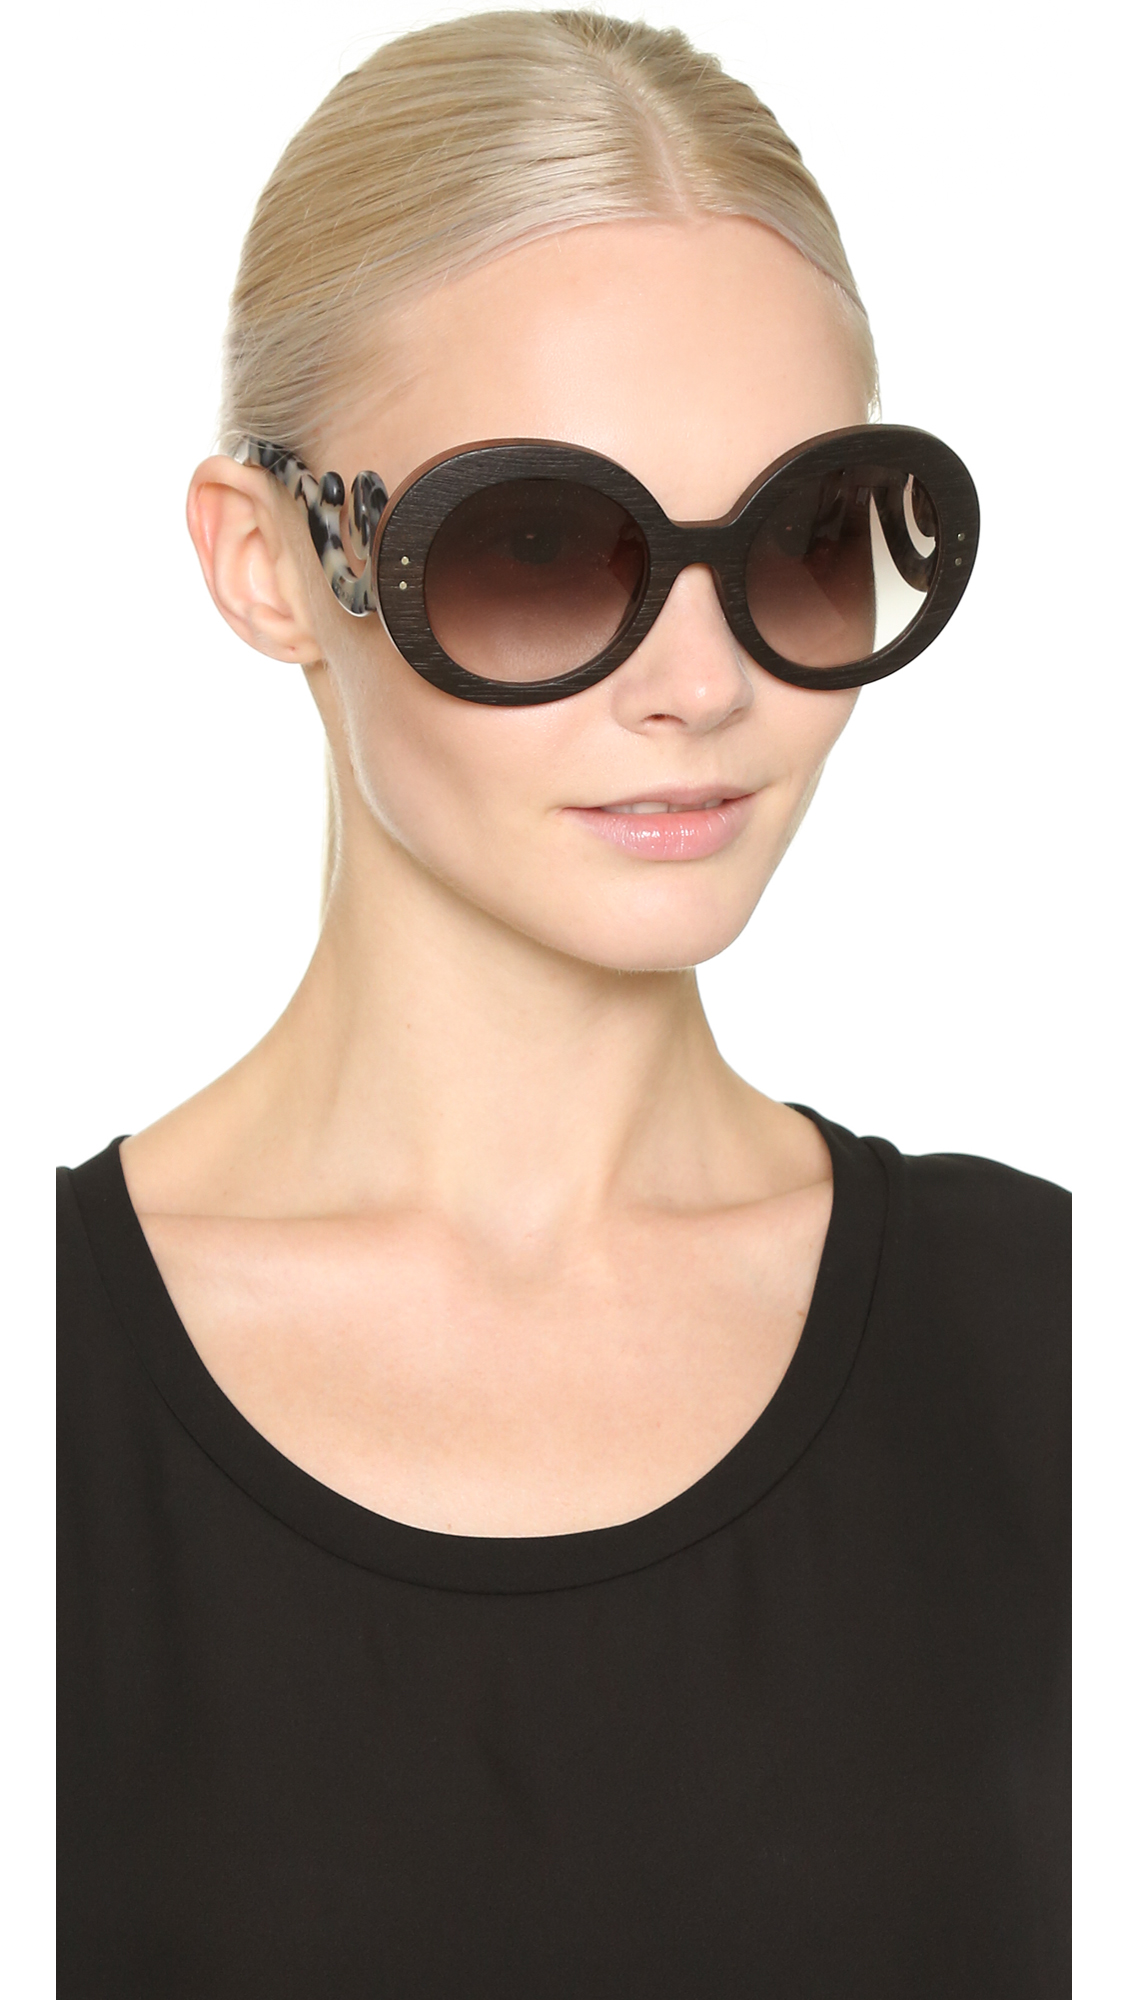 Prada Wood Sunglasses Shopbop